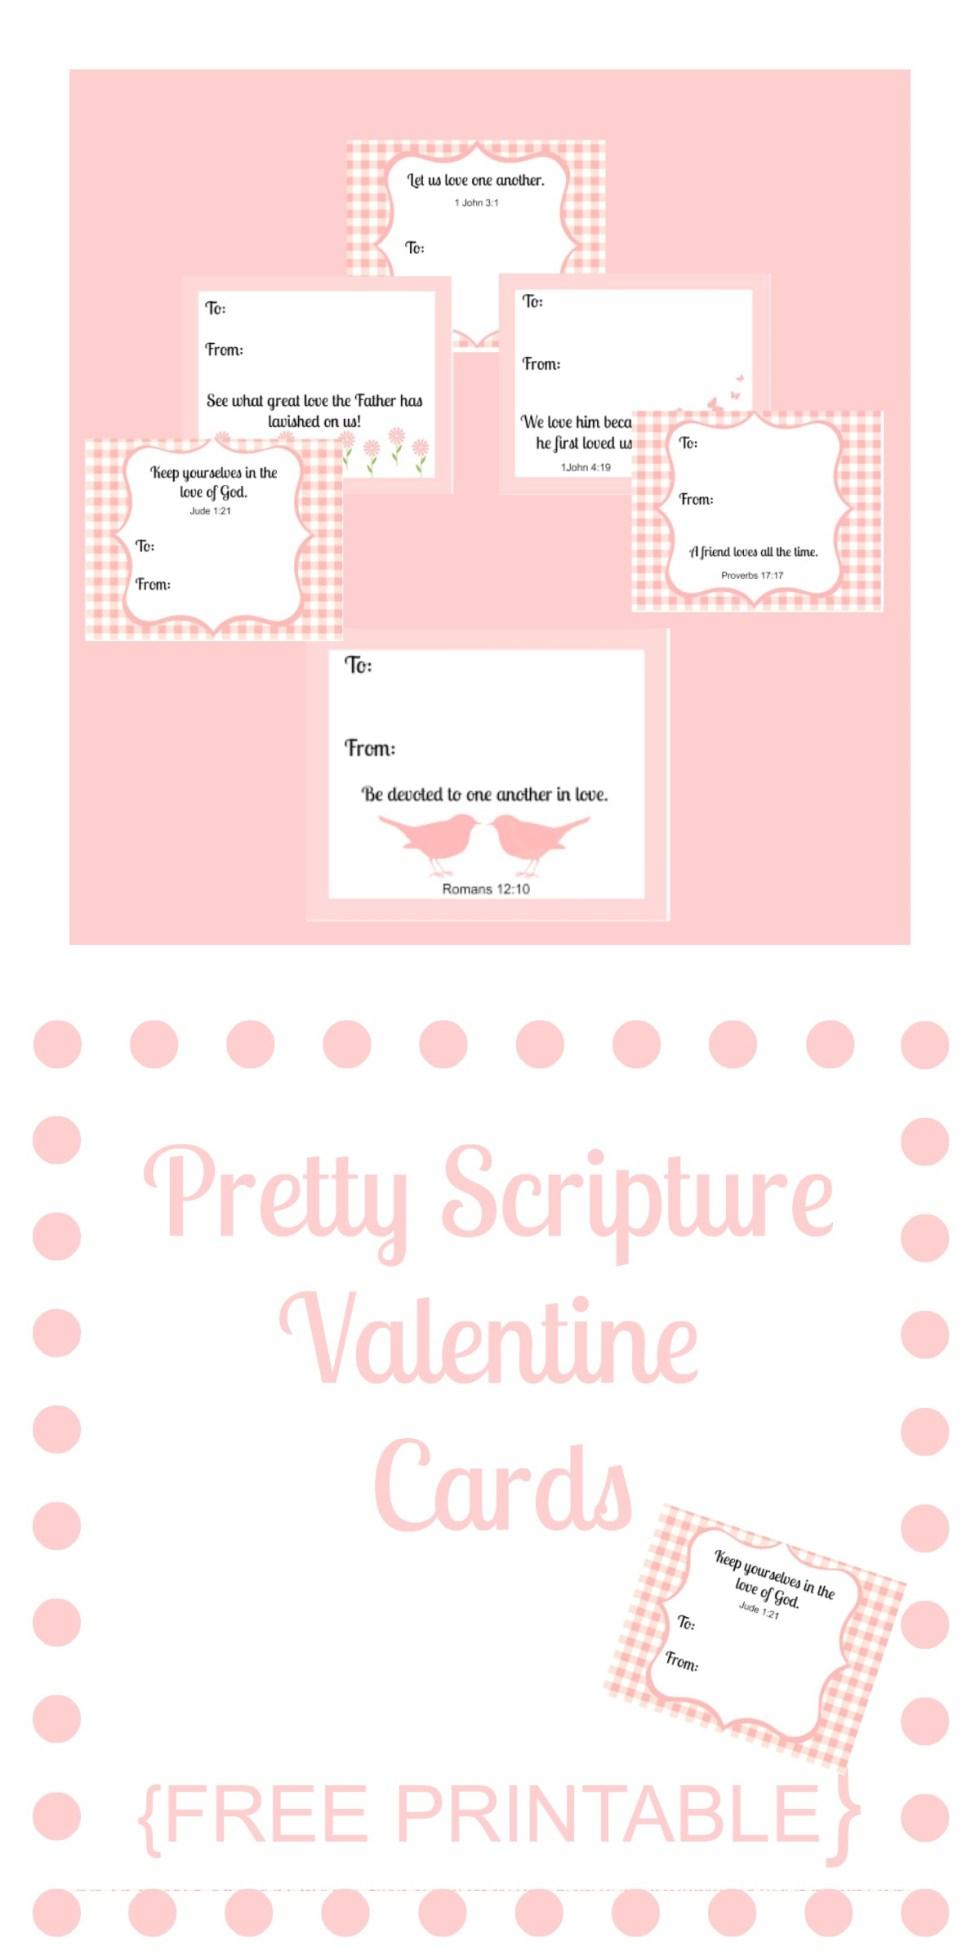 Pretty Scripture Valentine Cards {FREE PRINTABLE}